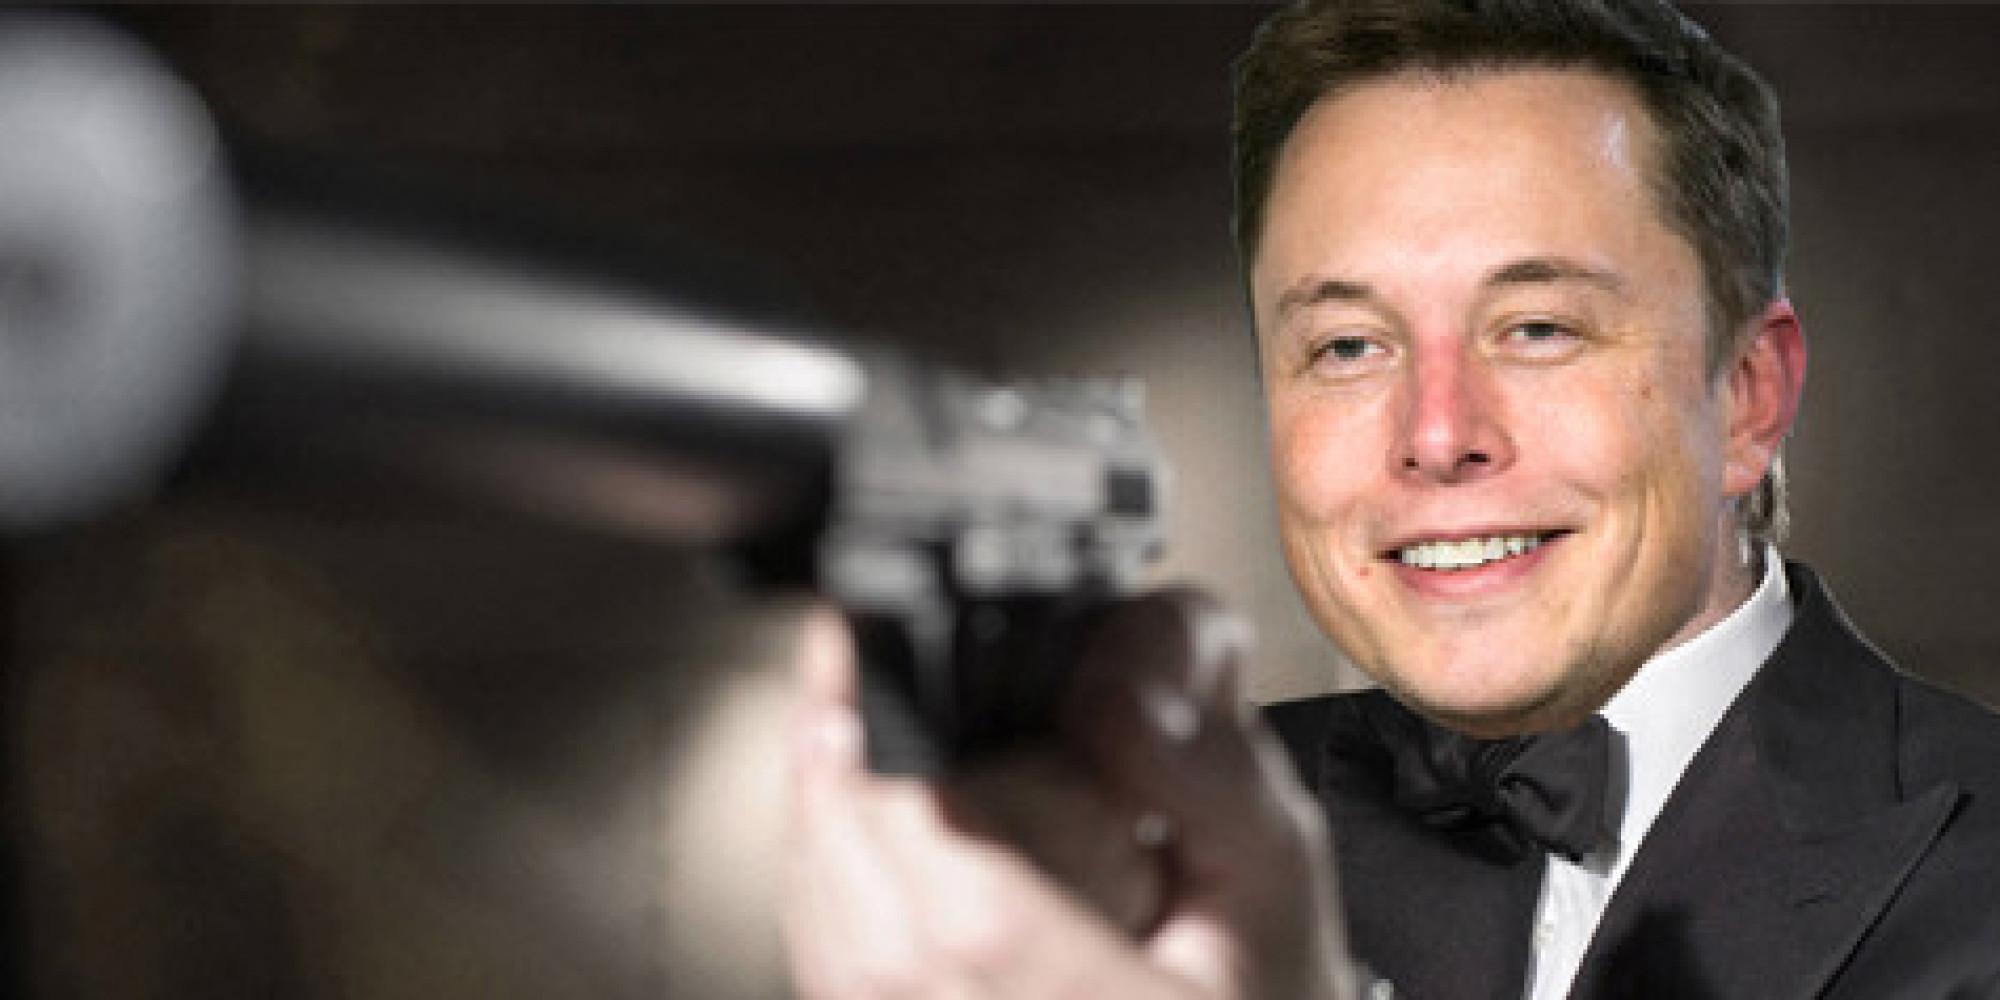 Elon Musk Putting Tesla Engine In James Bond Submarine